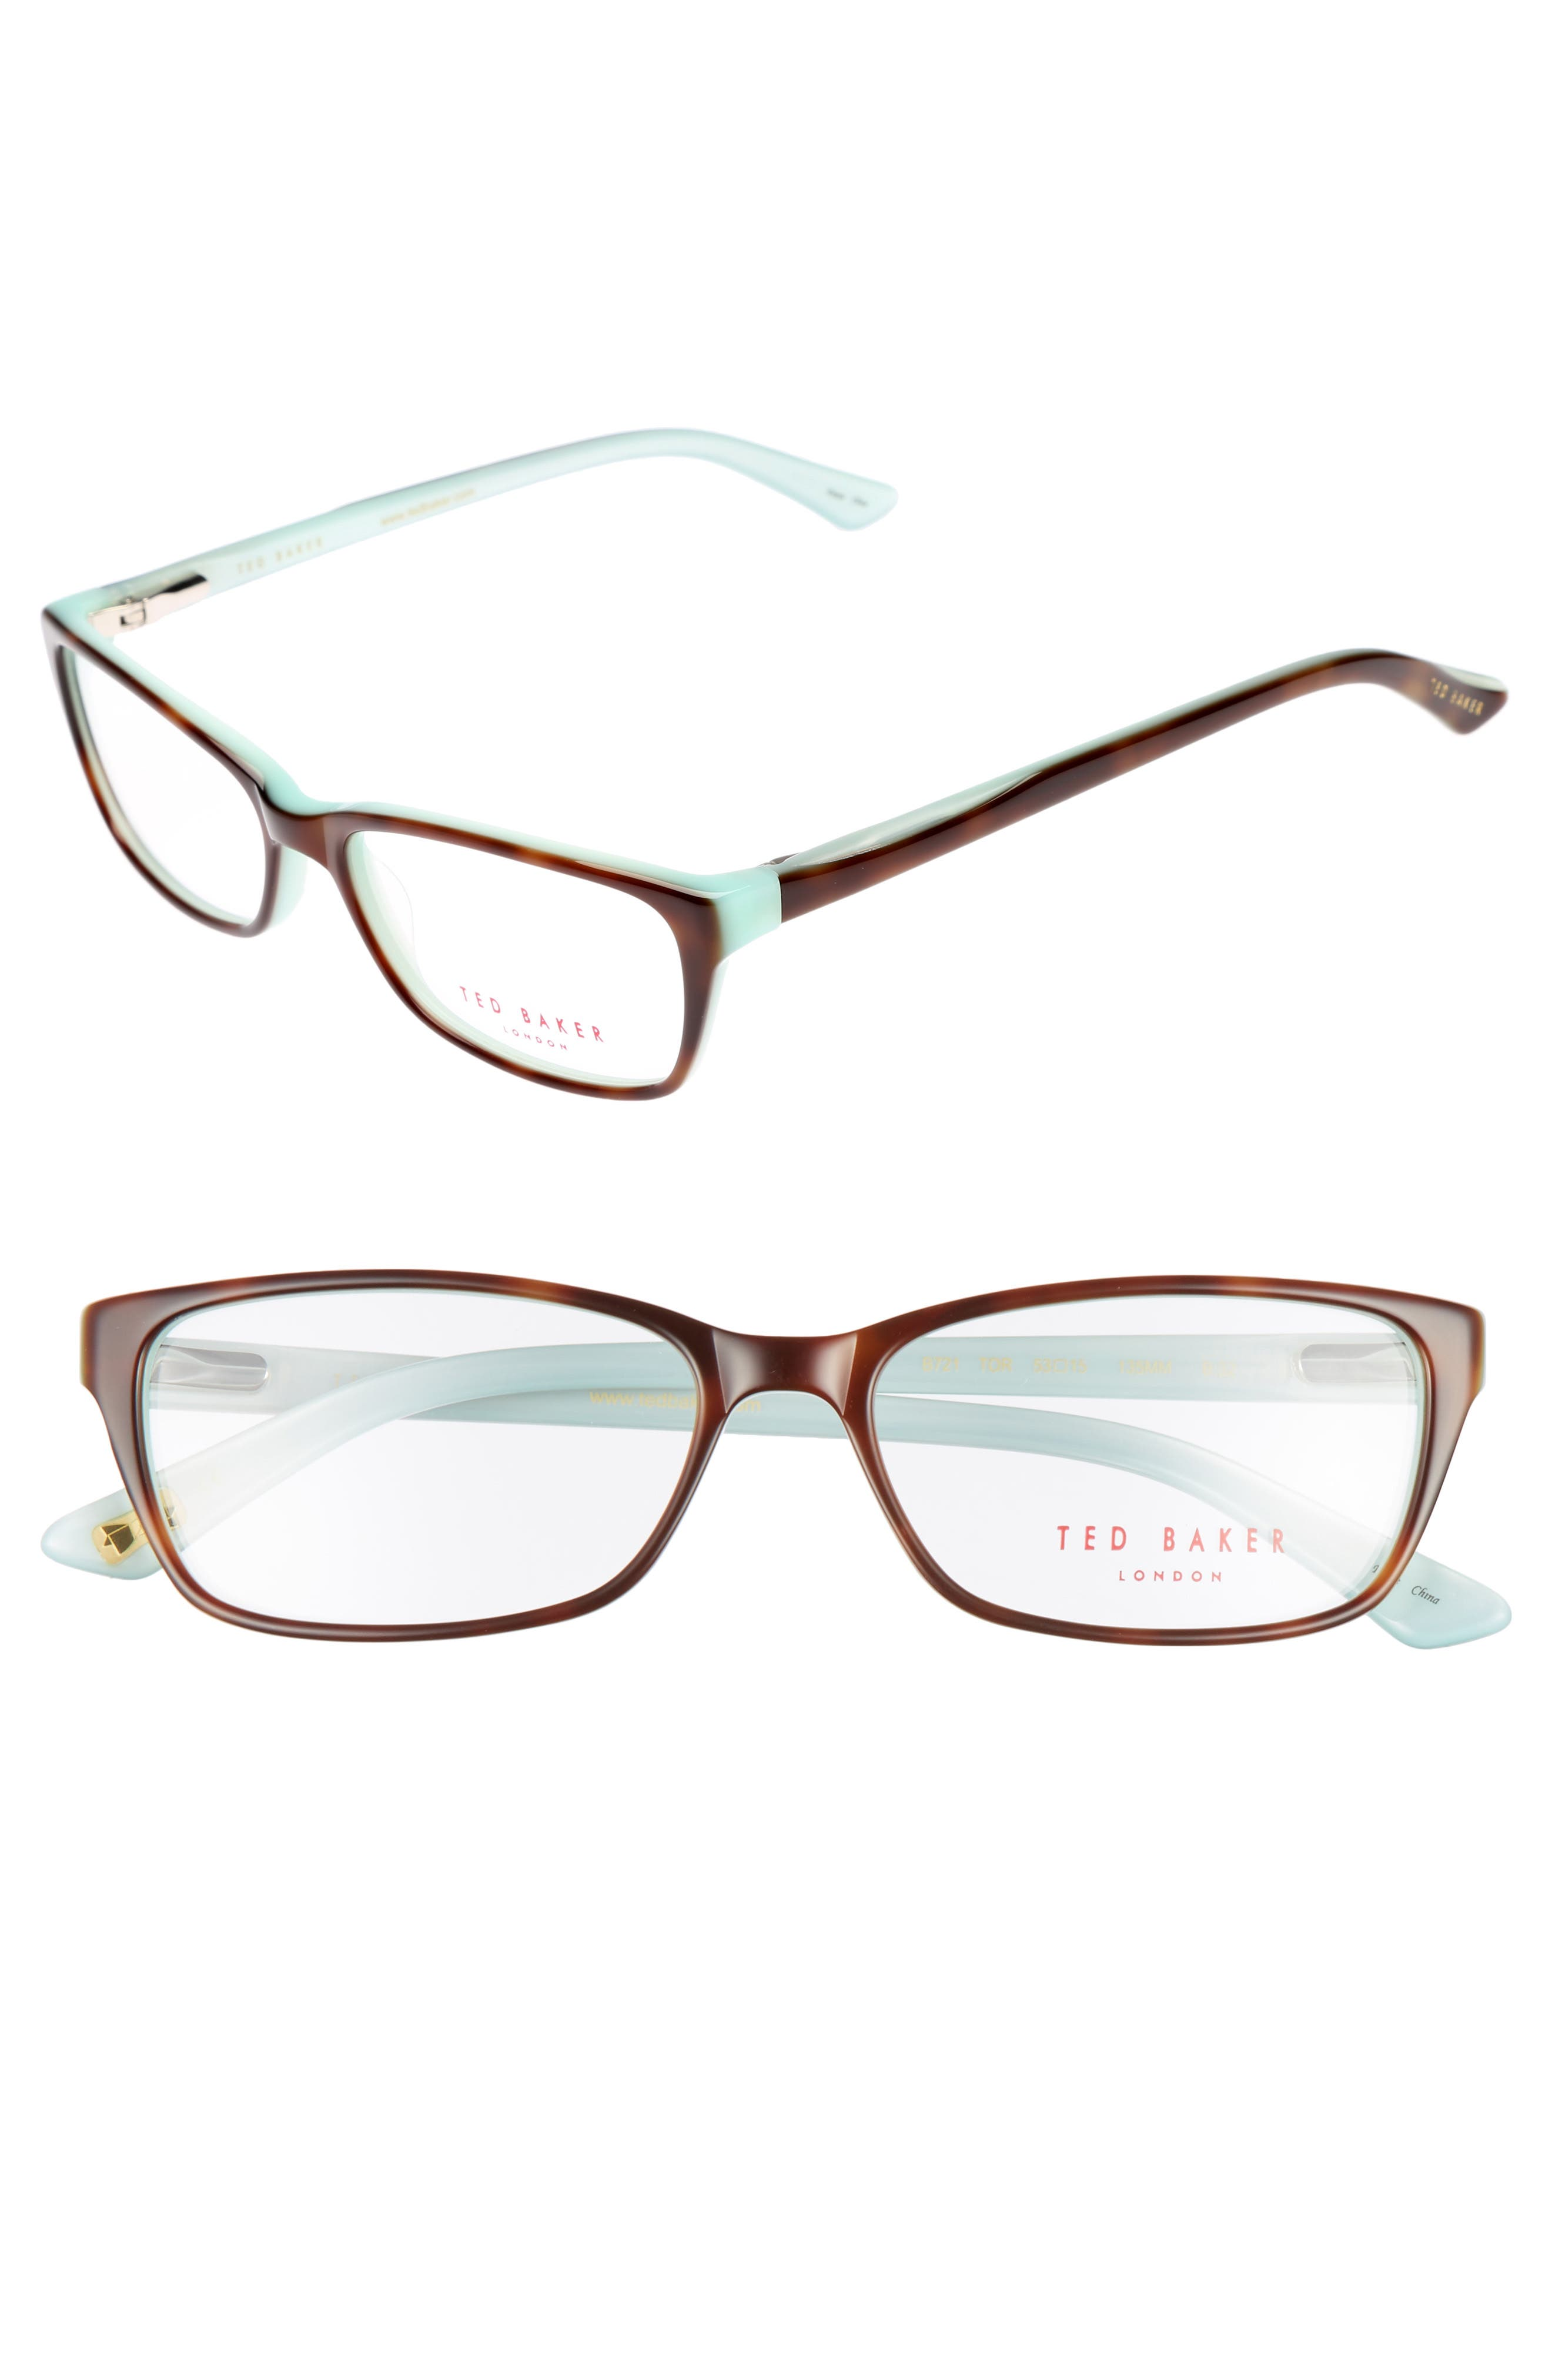 53mm Optical Glasses,                             Main thumbnail 2, color,